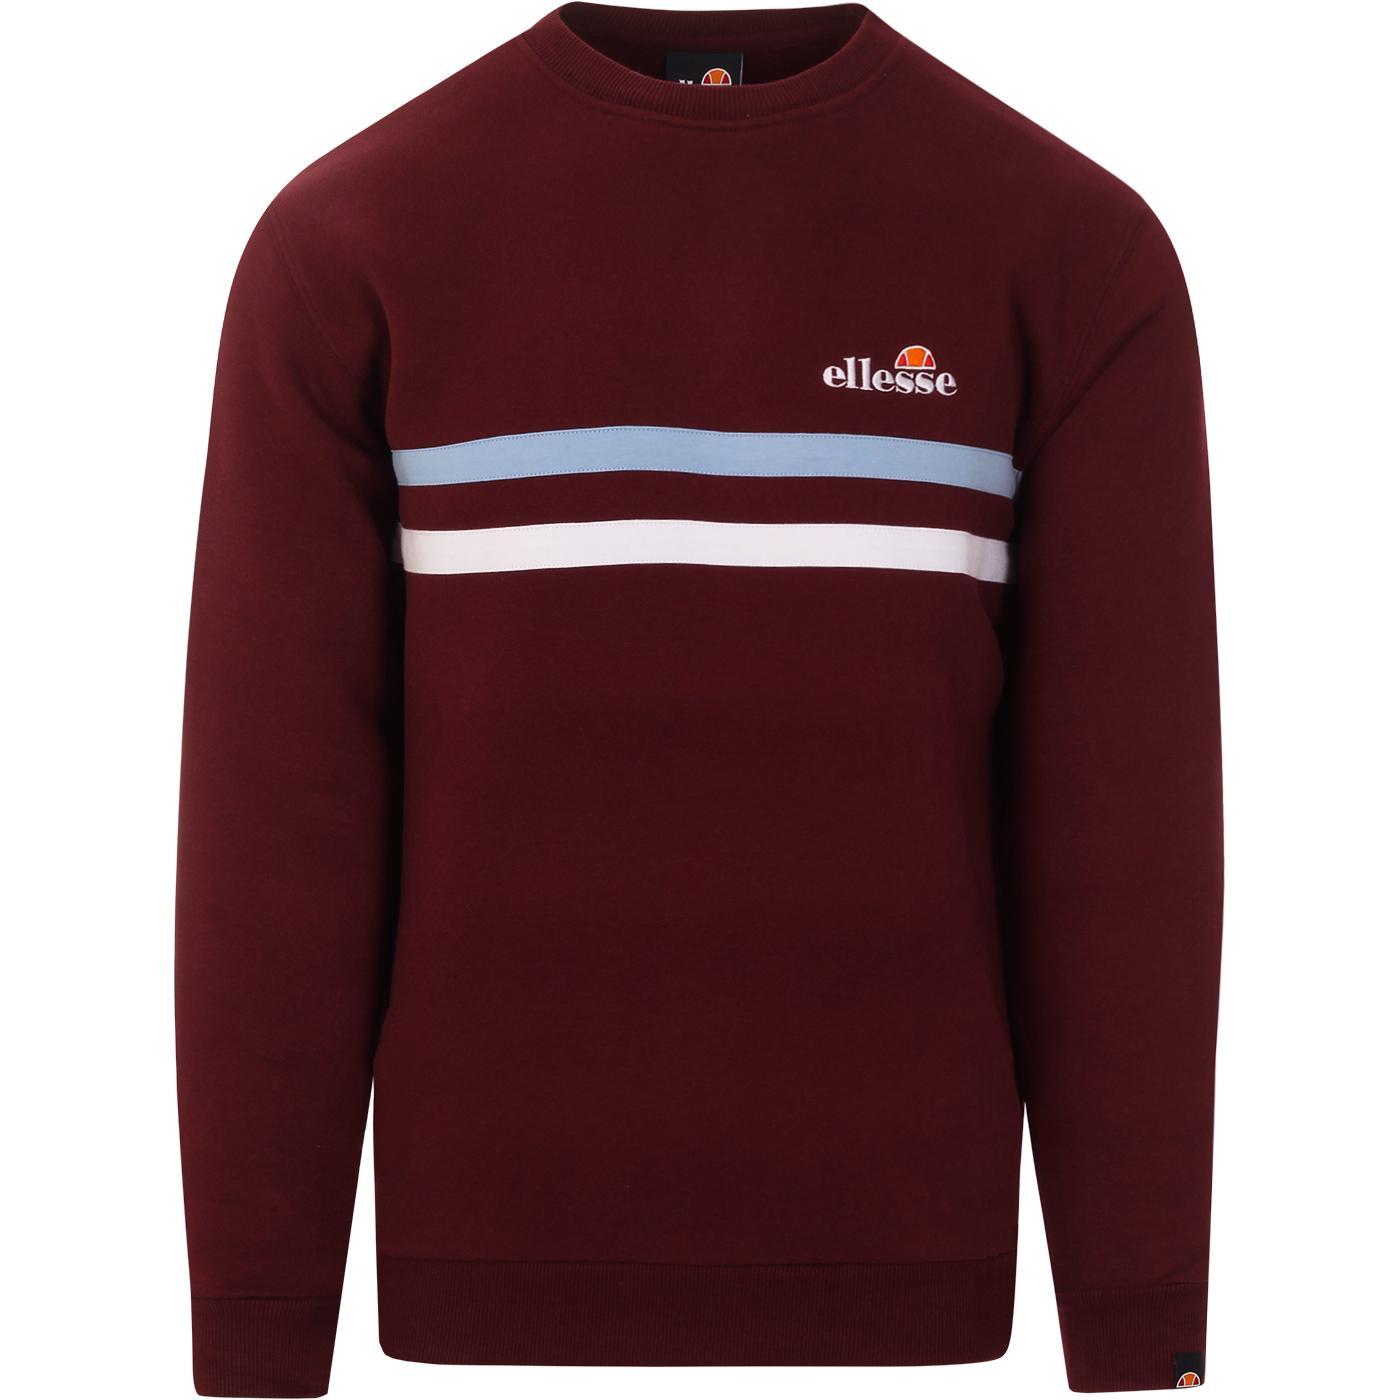 Erminion ELLESSE Retro Stripe Sweatshirt BURGUNDY